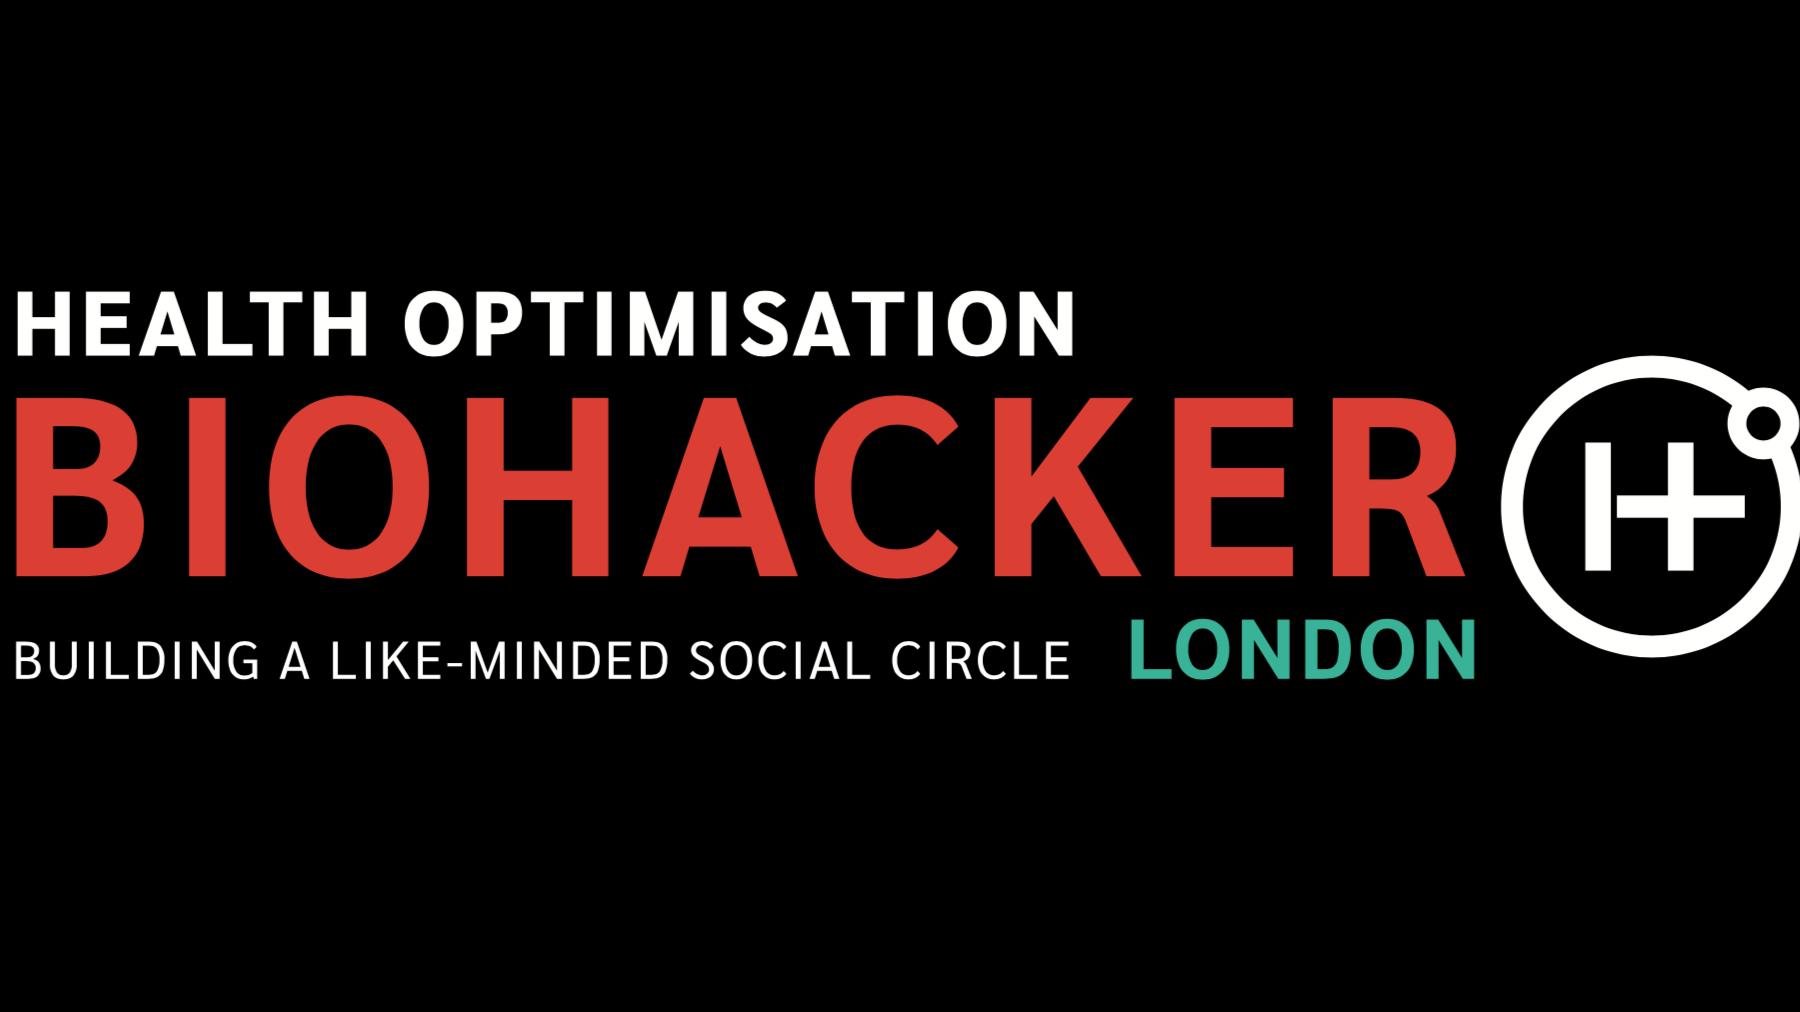 London Health Optimisation Biohacker Social Circle